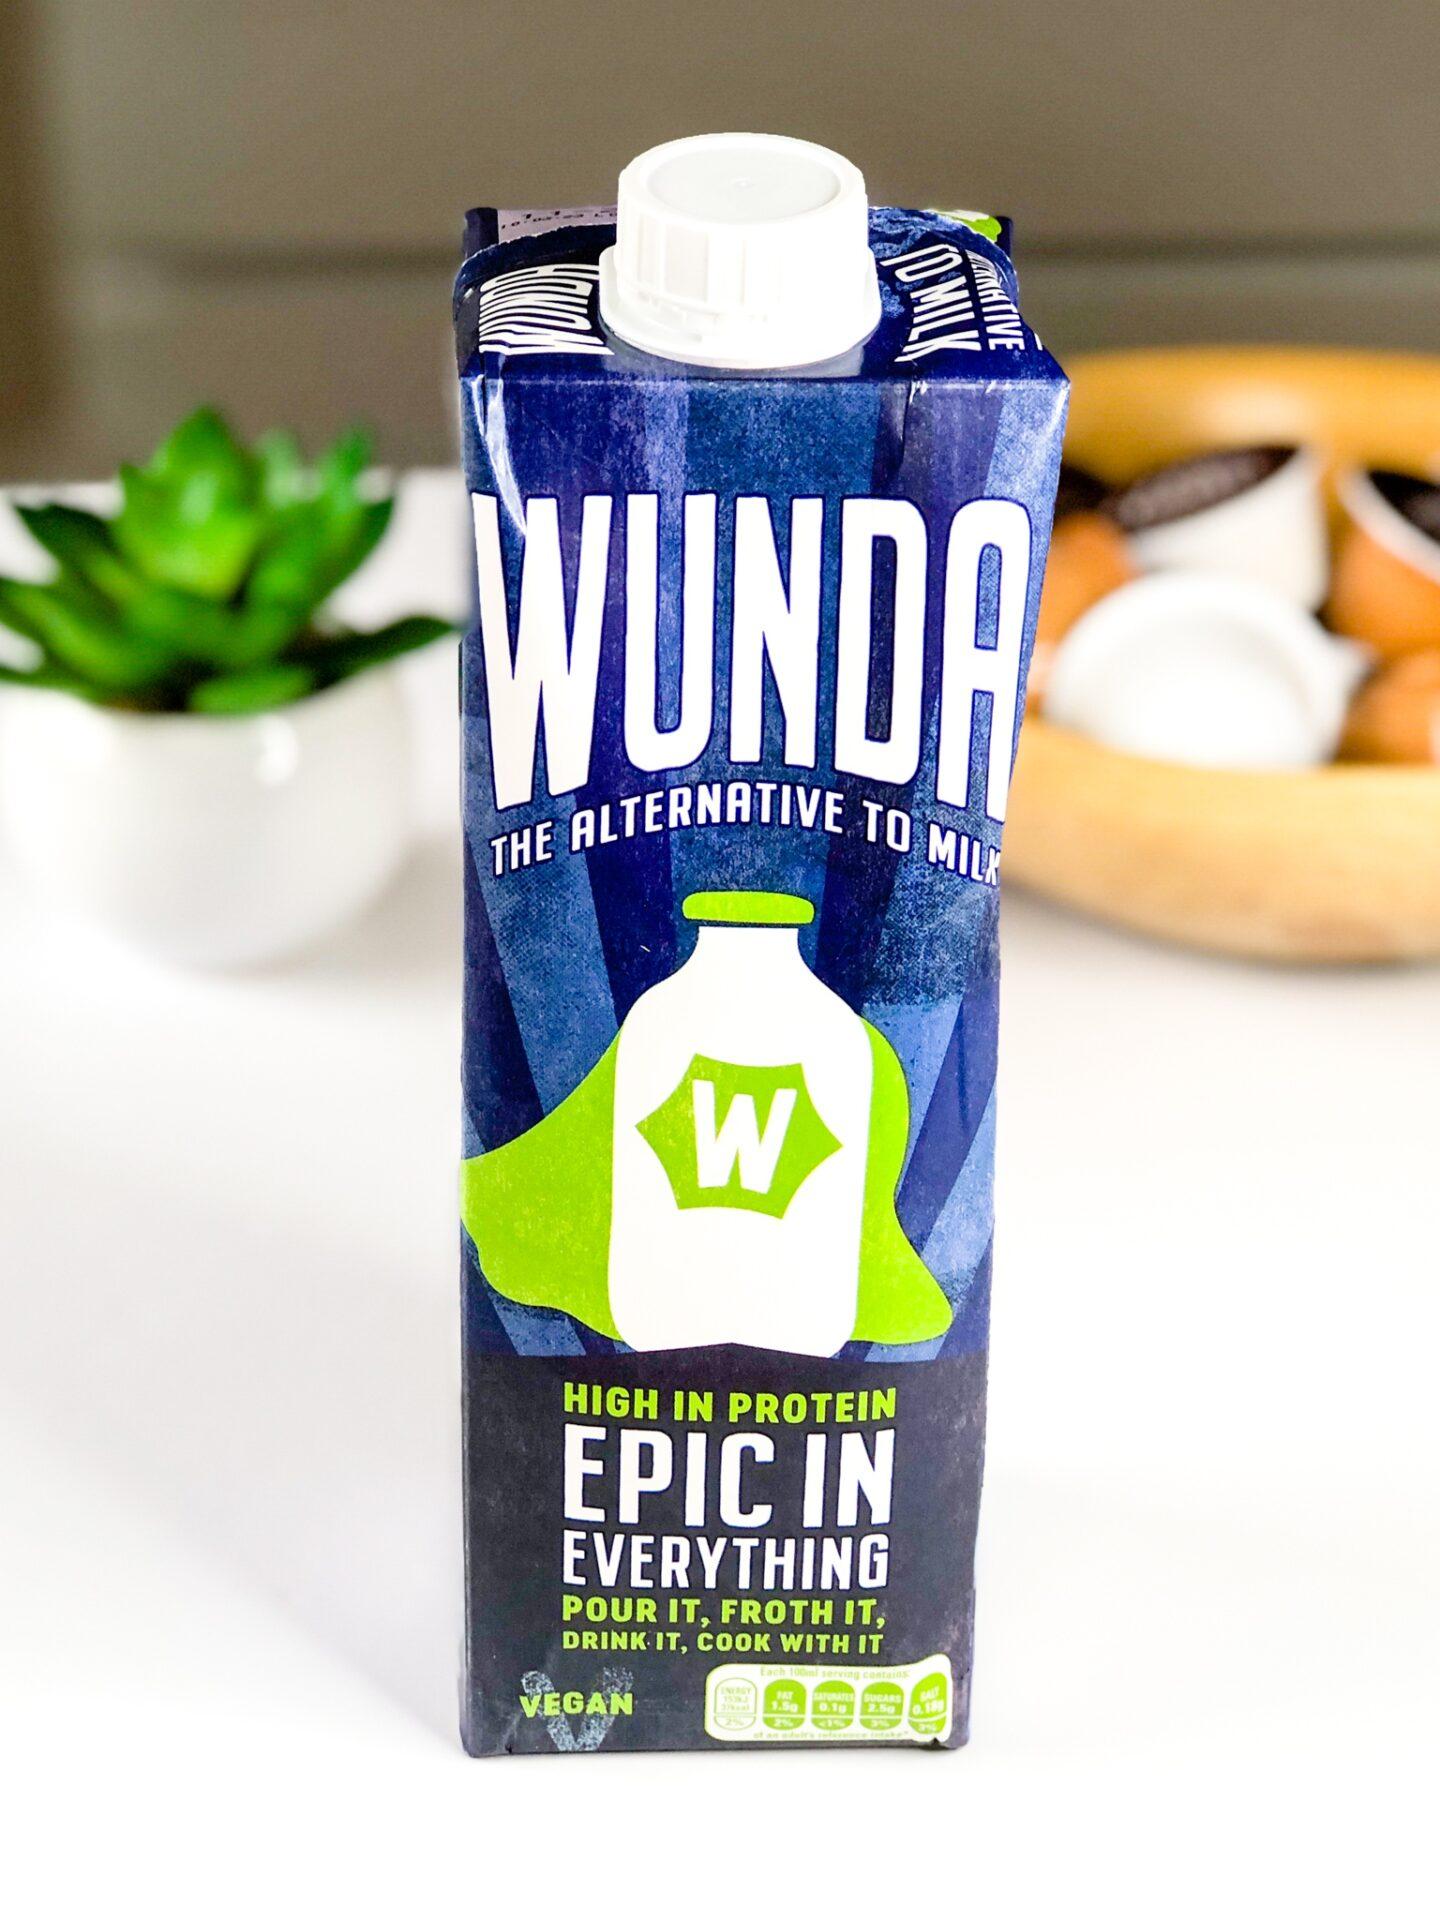 Wunda Milk Alternative - July 2020 Degusta Box